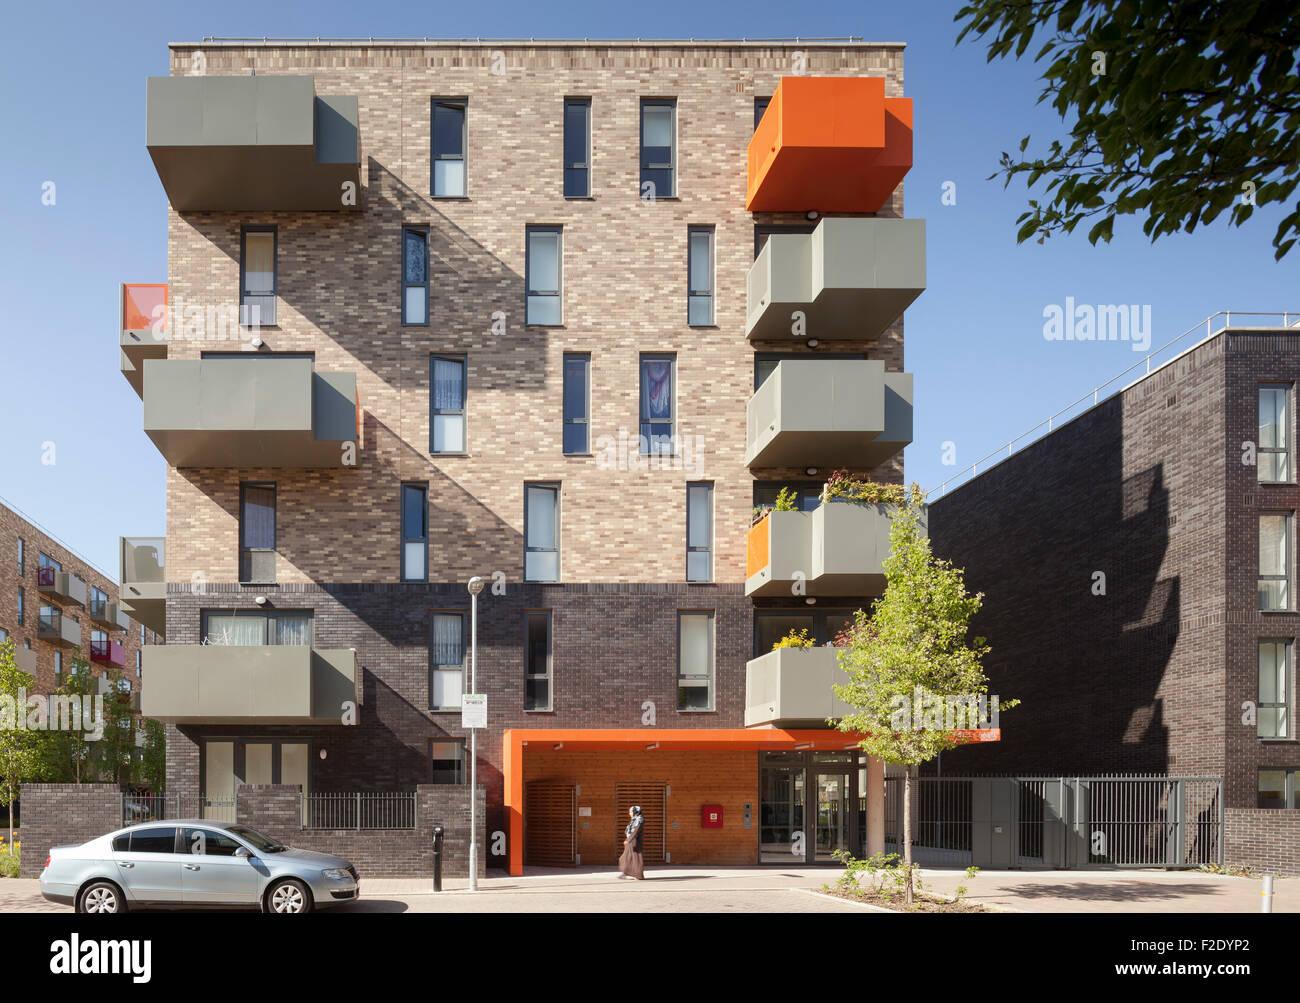 front elevation of multi storey housing flat ocean estate london united kingdom architect levitt bernstein 2015